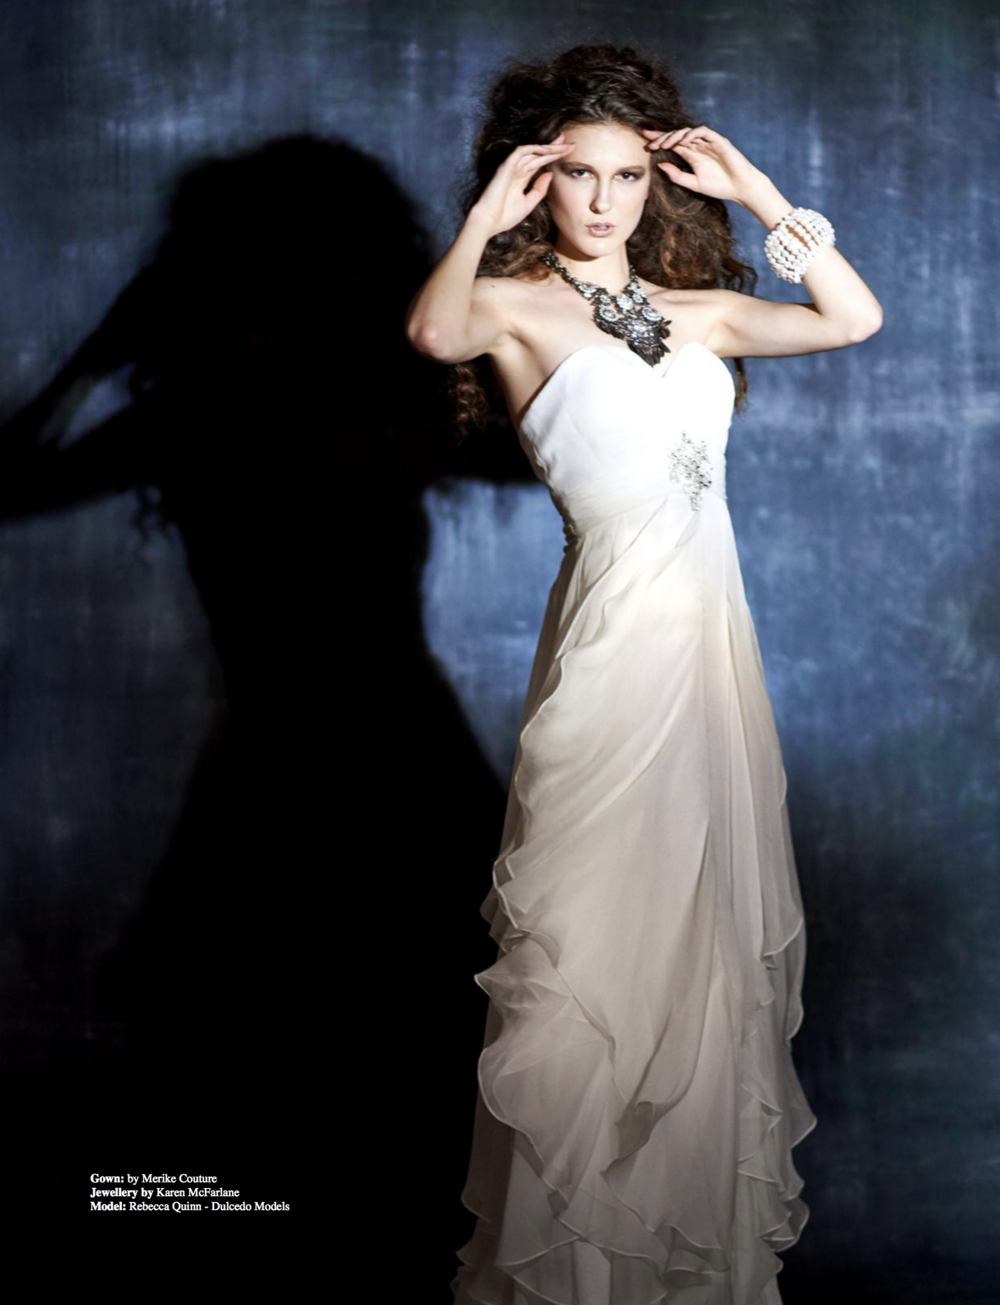 Marta-Hewson-Eluxe-Magazine-Dulcedo-Models-Torontoi-Fashion-Photography.png